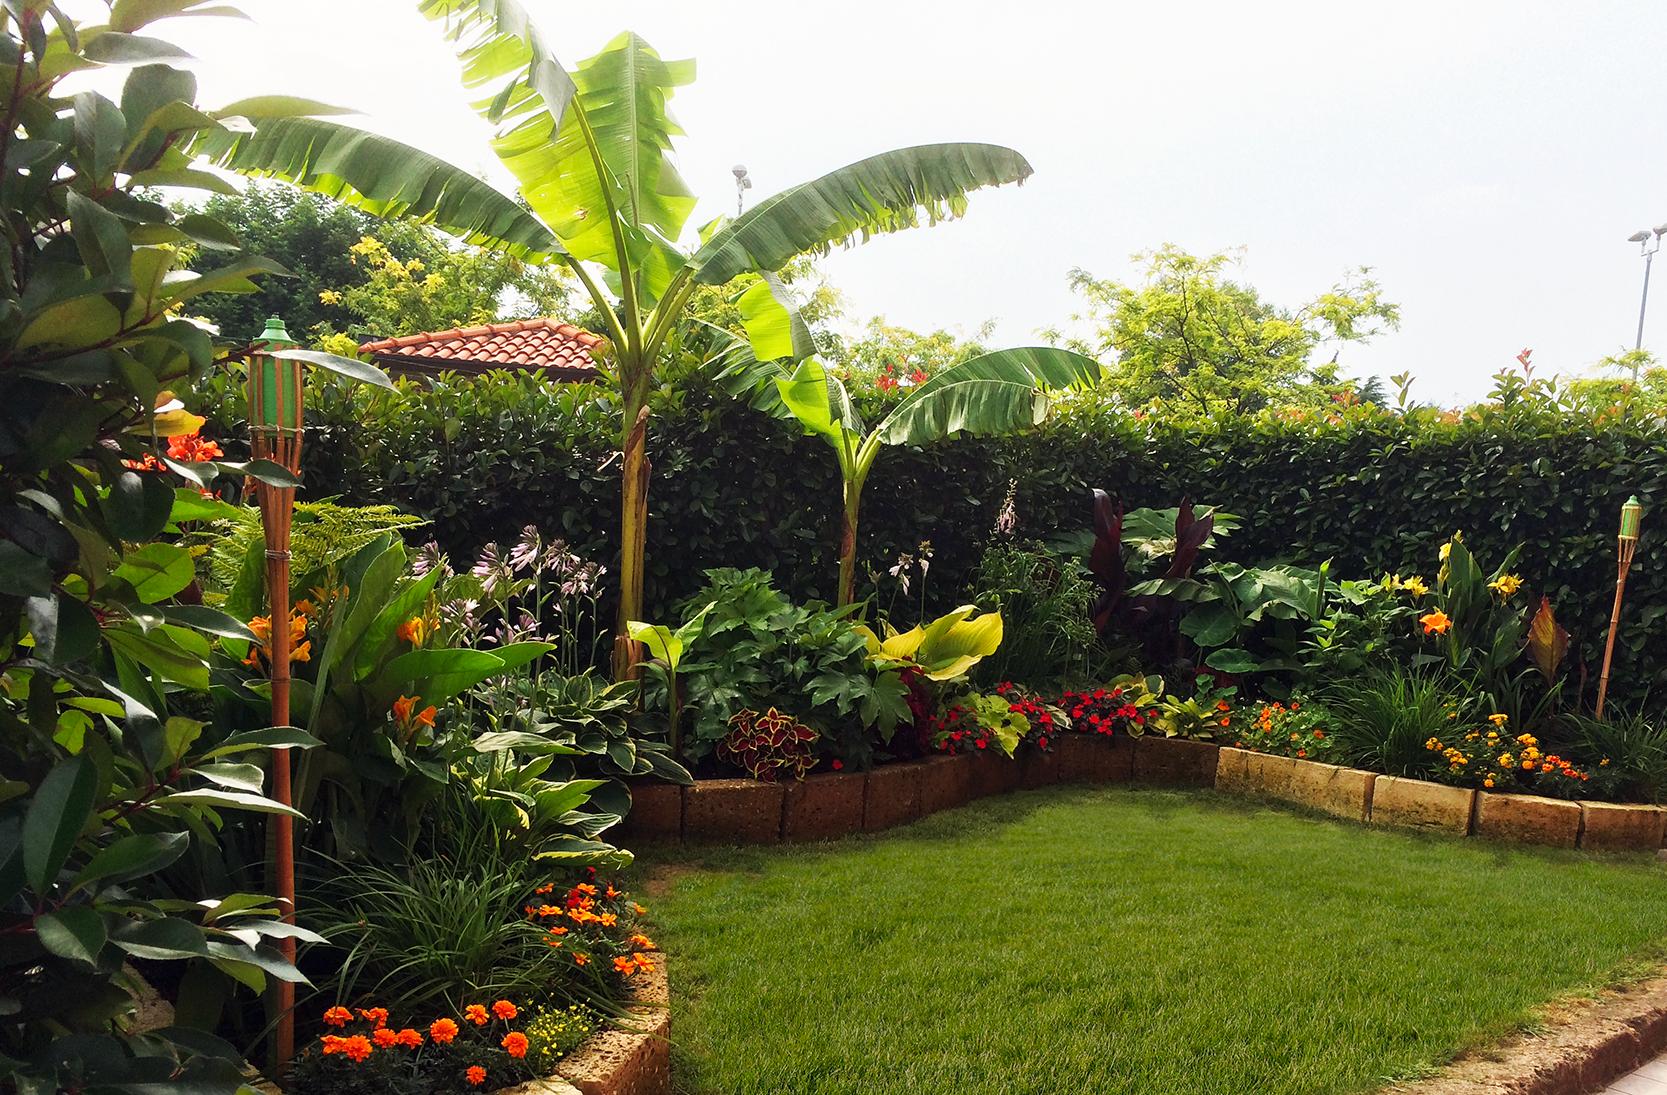 My Little Tropical Garden Il Mio Piccolo Giardino